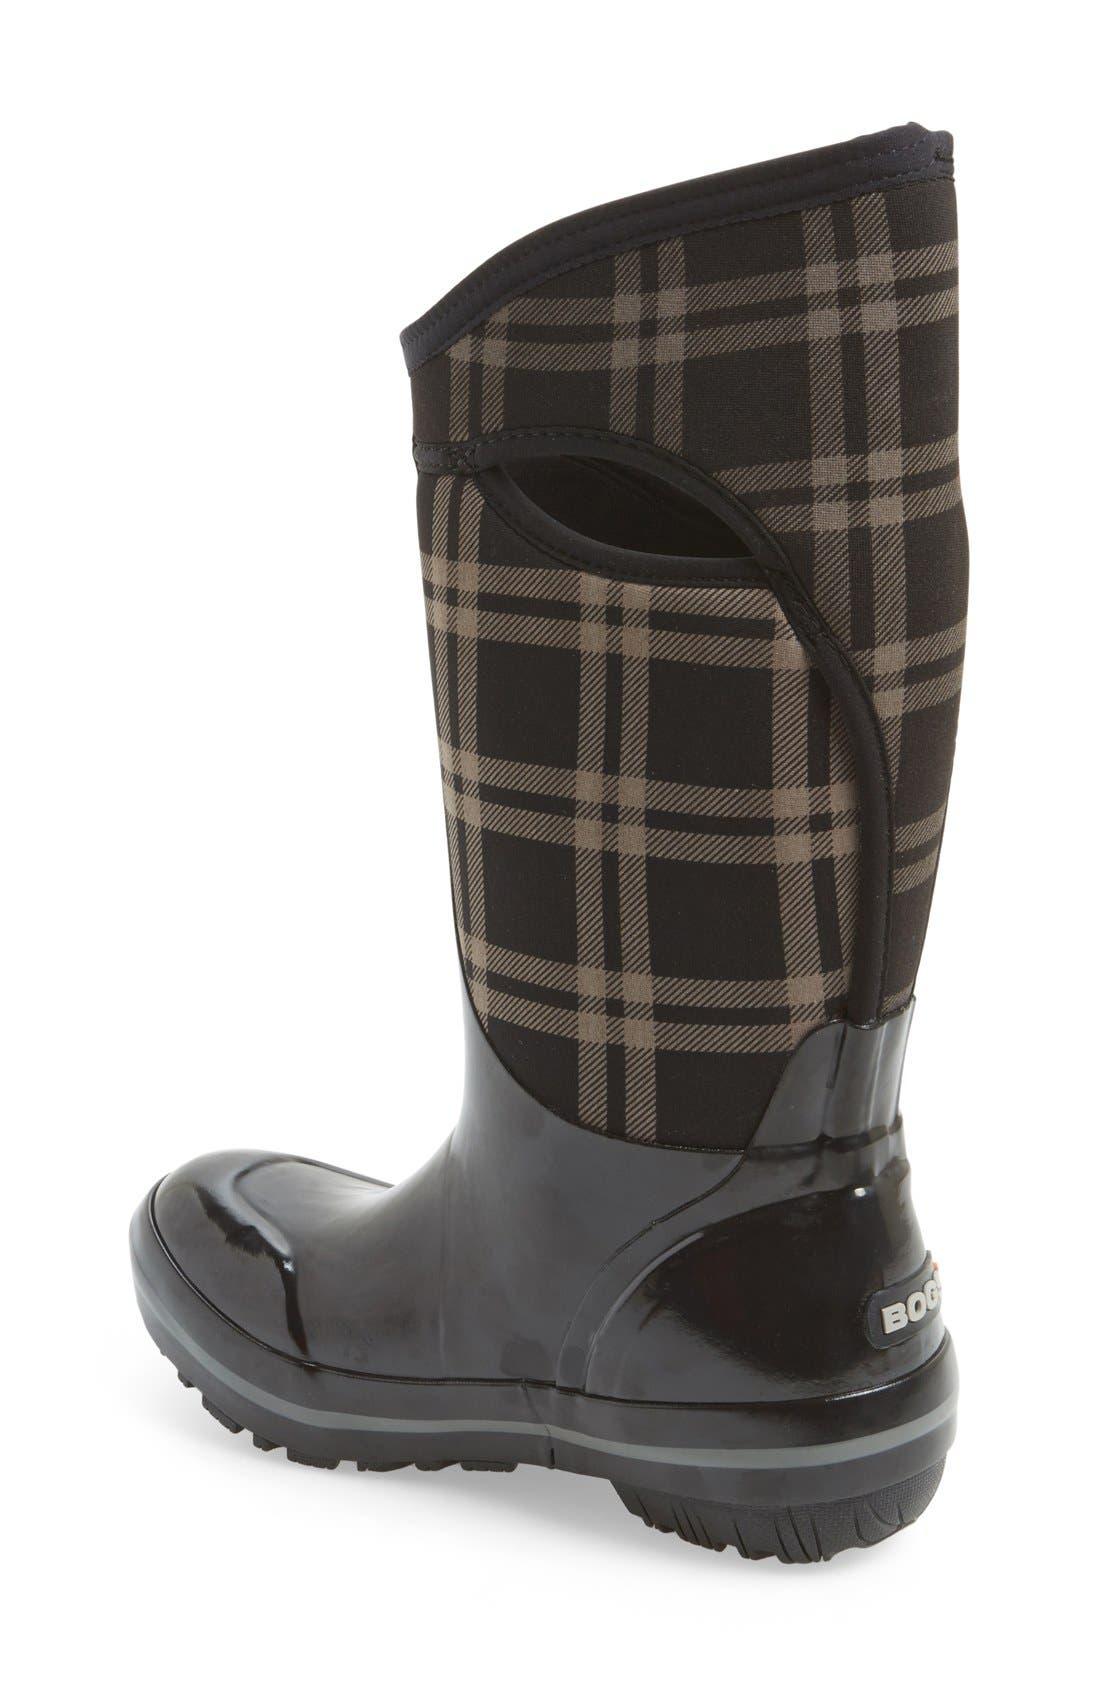 Alternate Image 2  - Bogs 'Plimsoll' Waterproof Boot (Women)